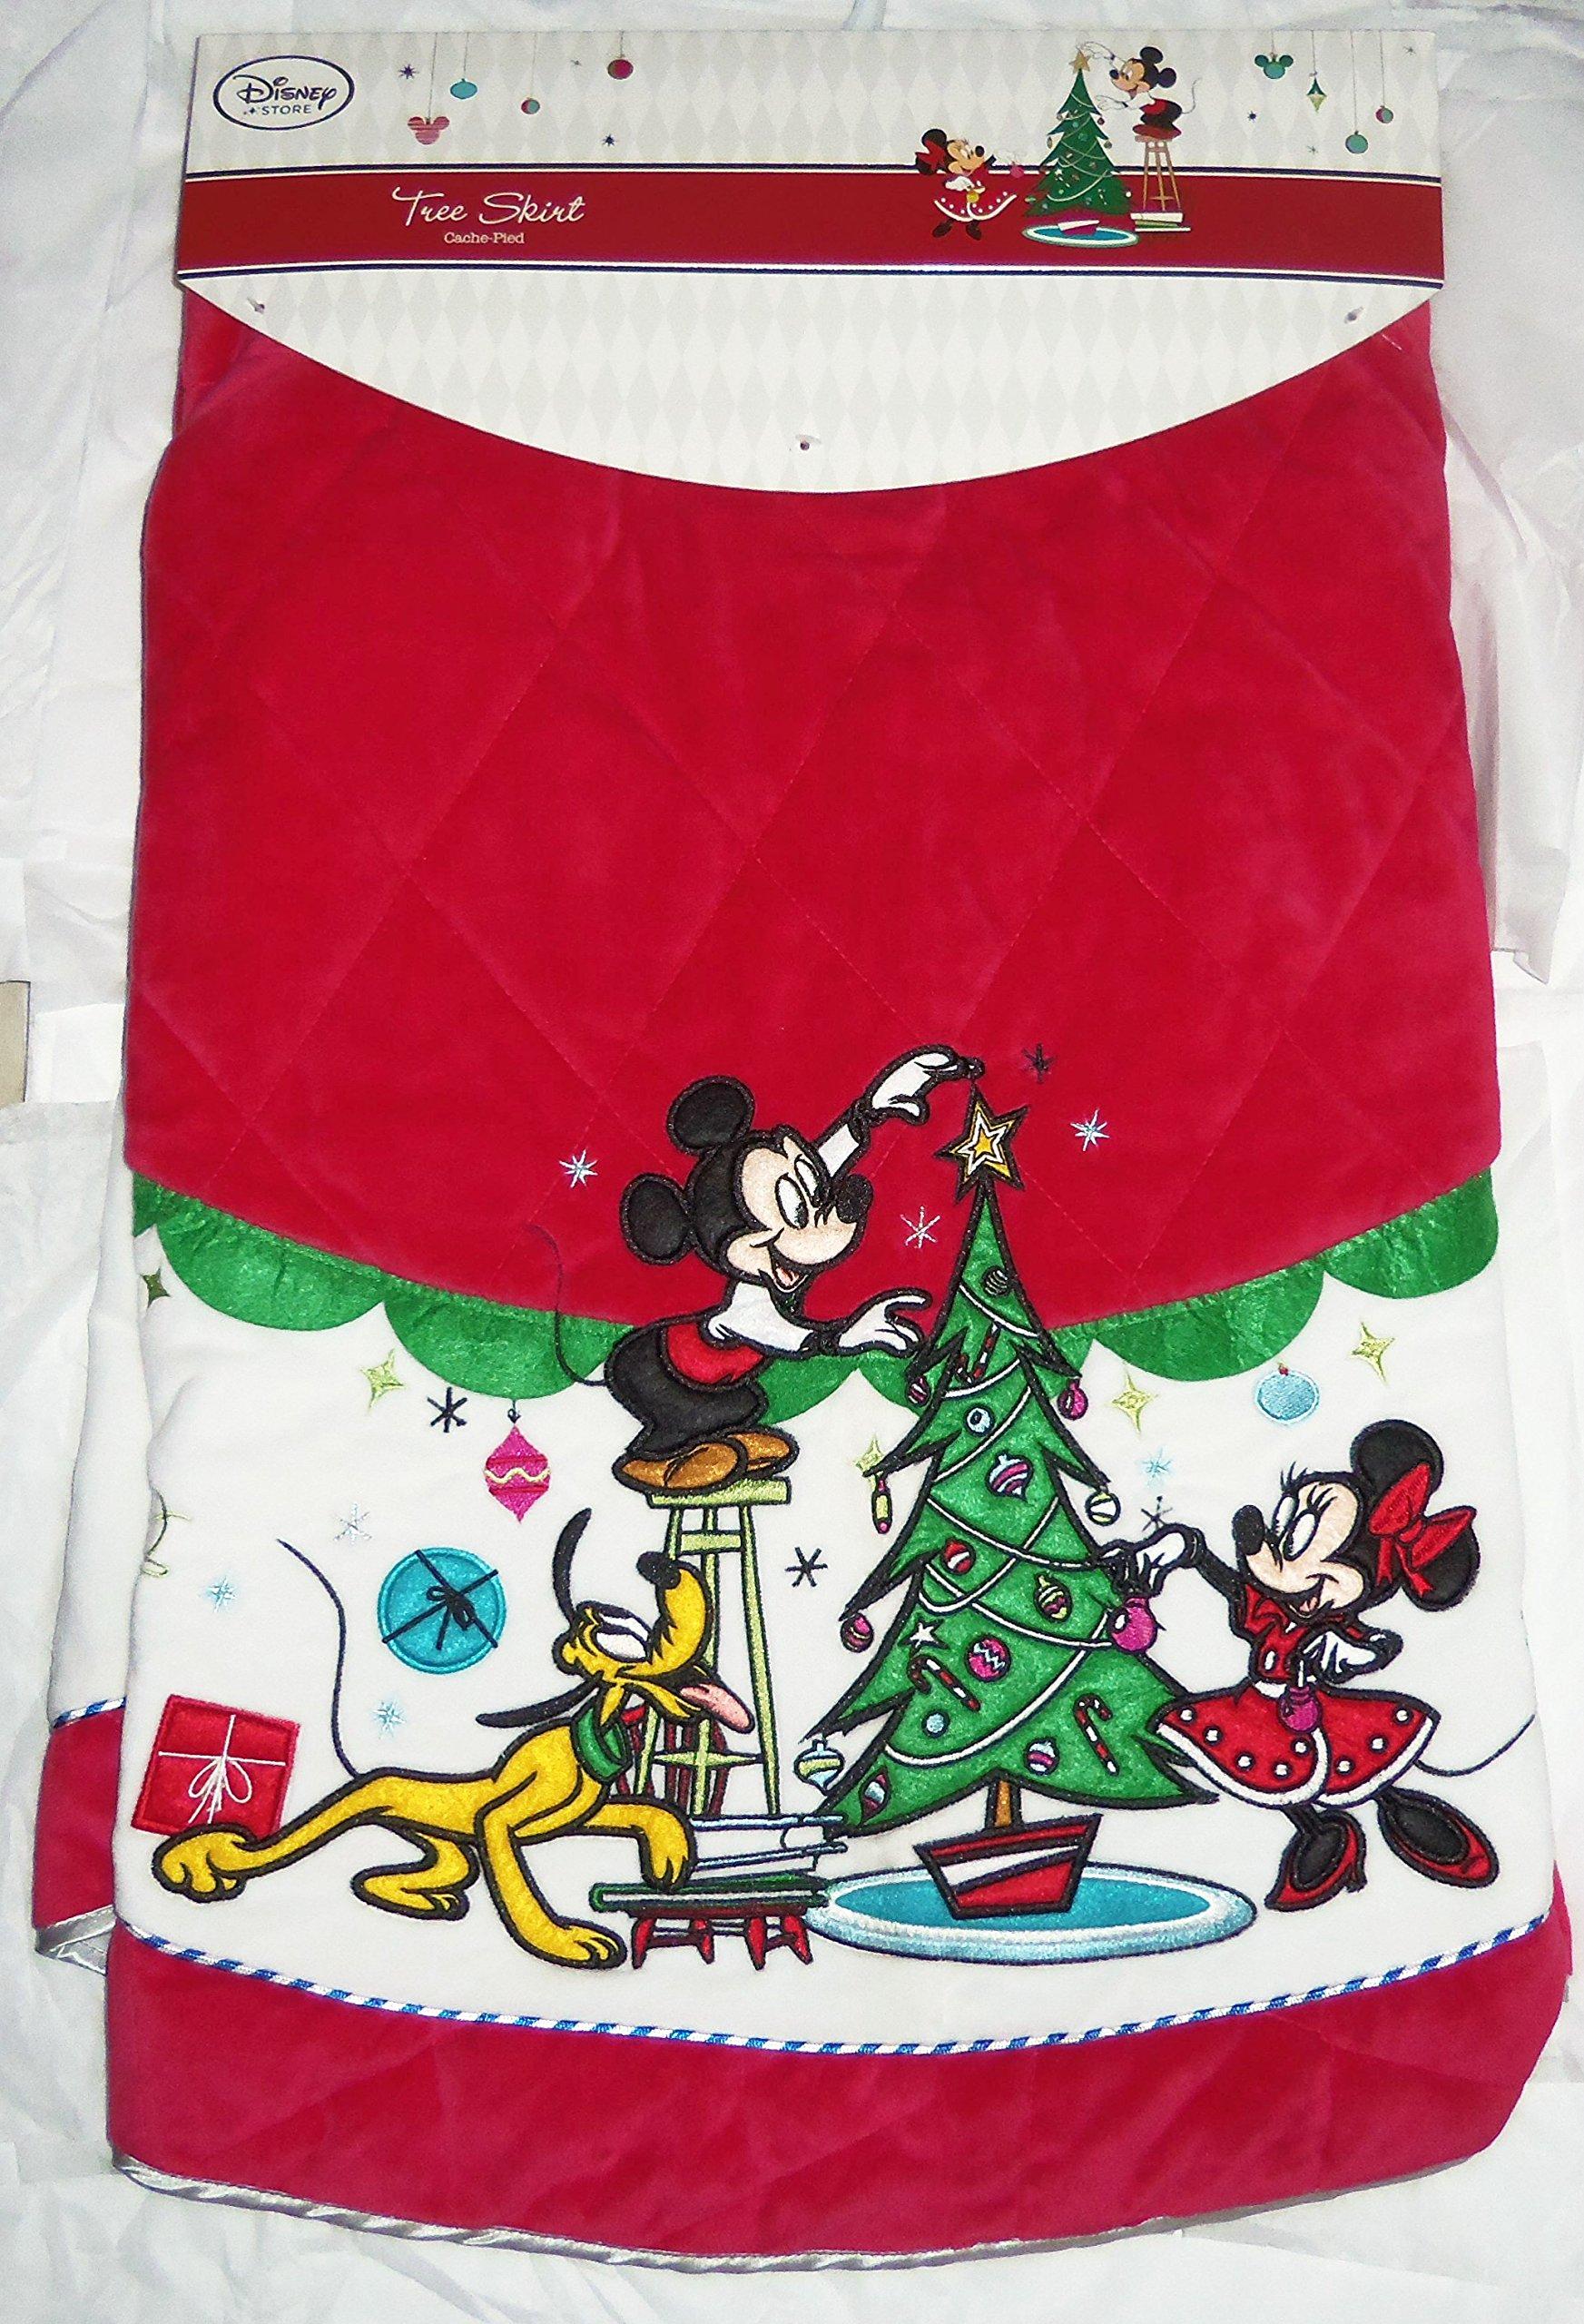 Disney Store Christmas Tree Skirt Minnie Mickey Mouse Pluto Red